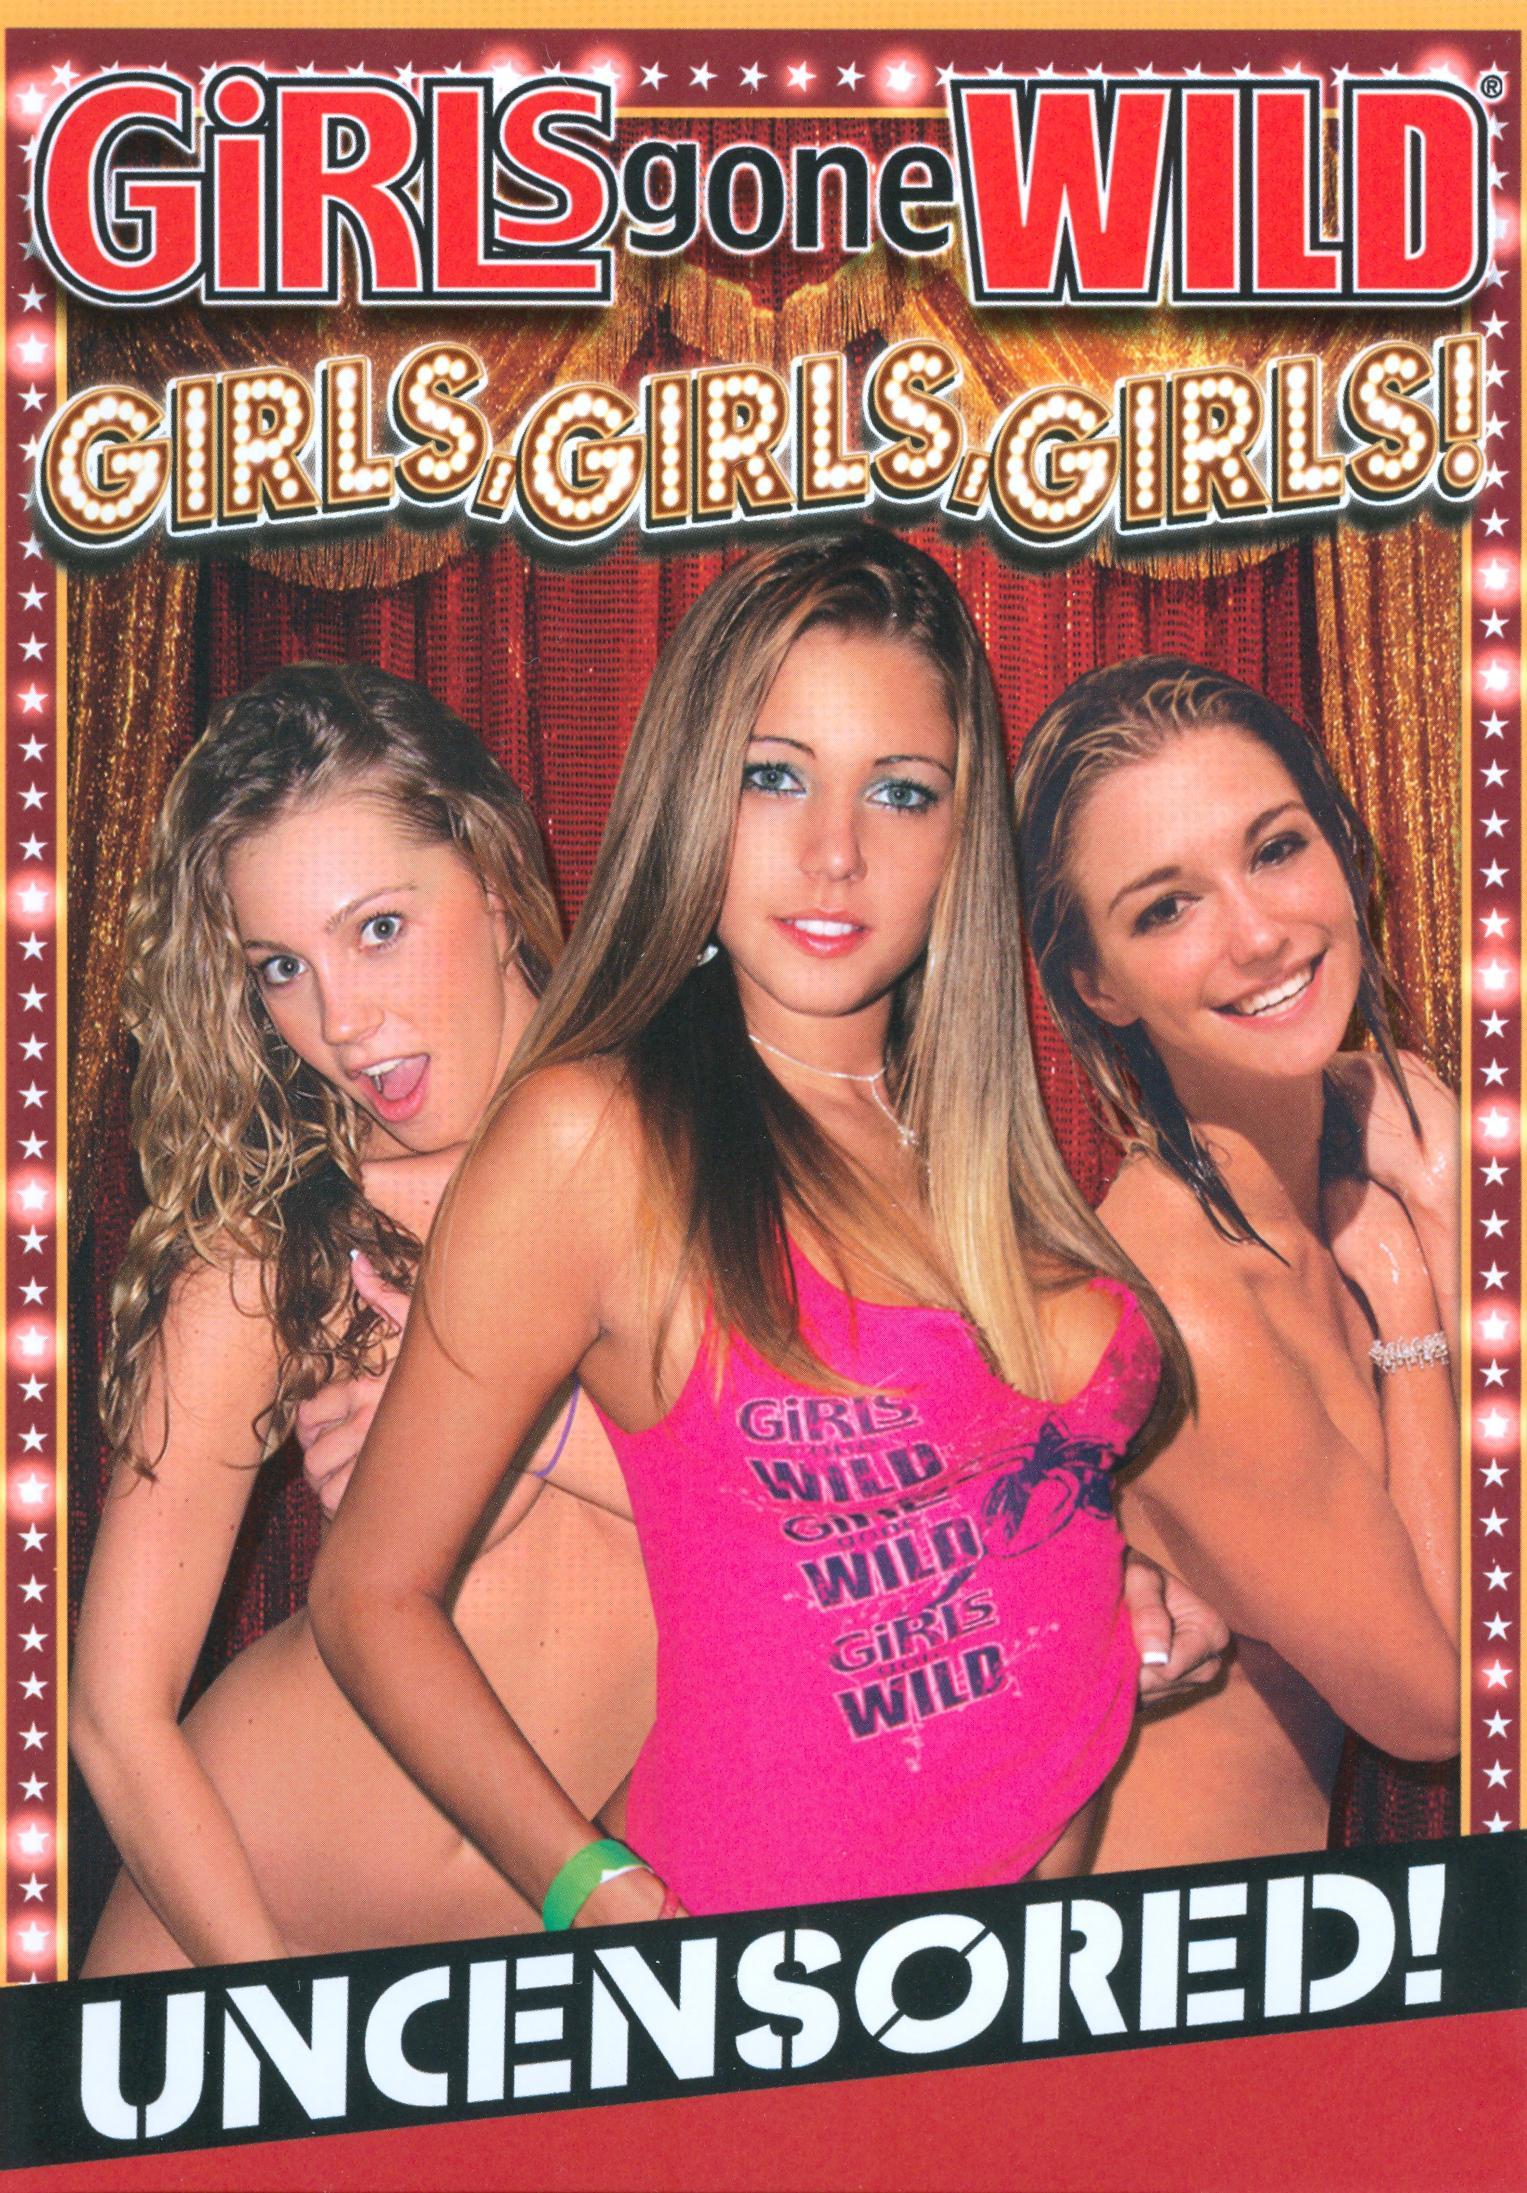 Girls Gone Wild Girls, Girls, Girls 2008 -  Releases -9317